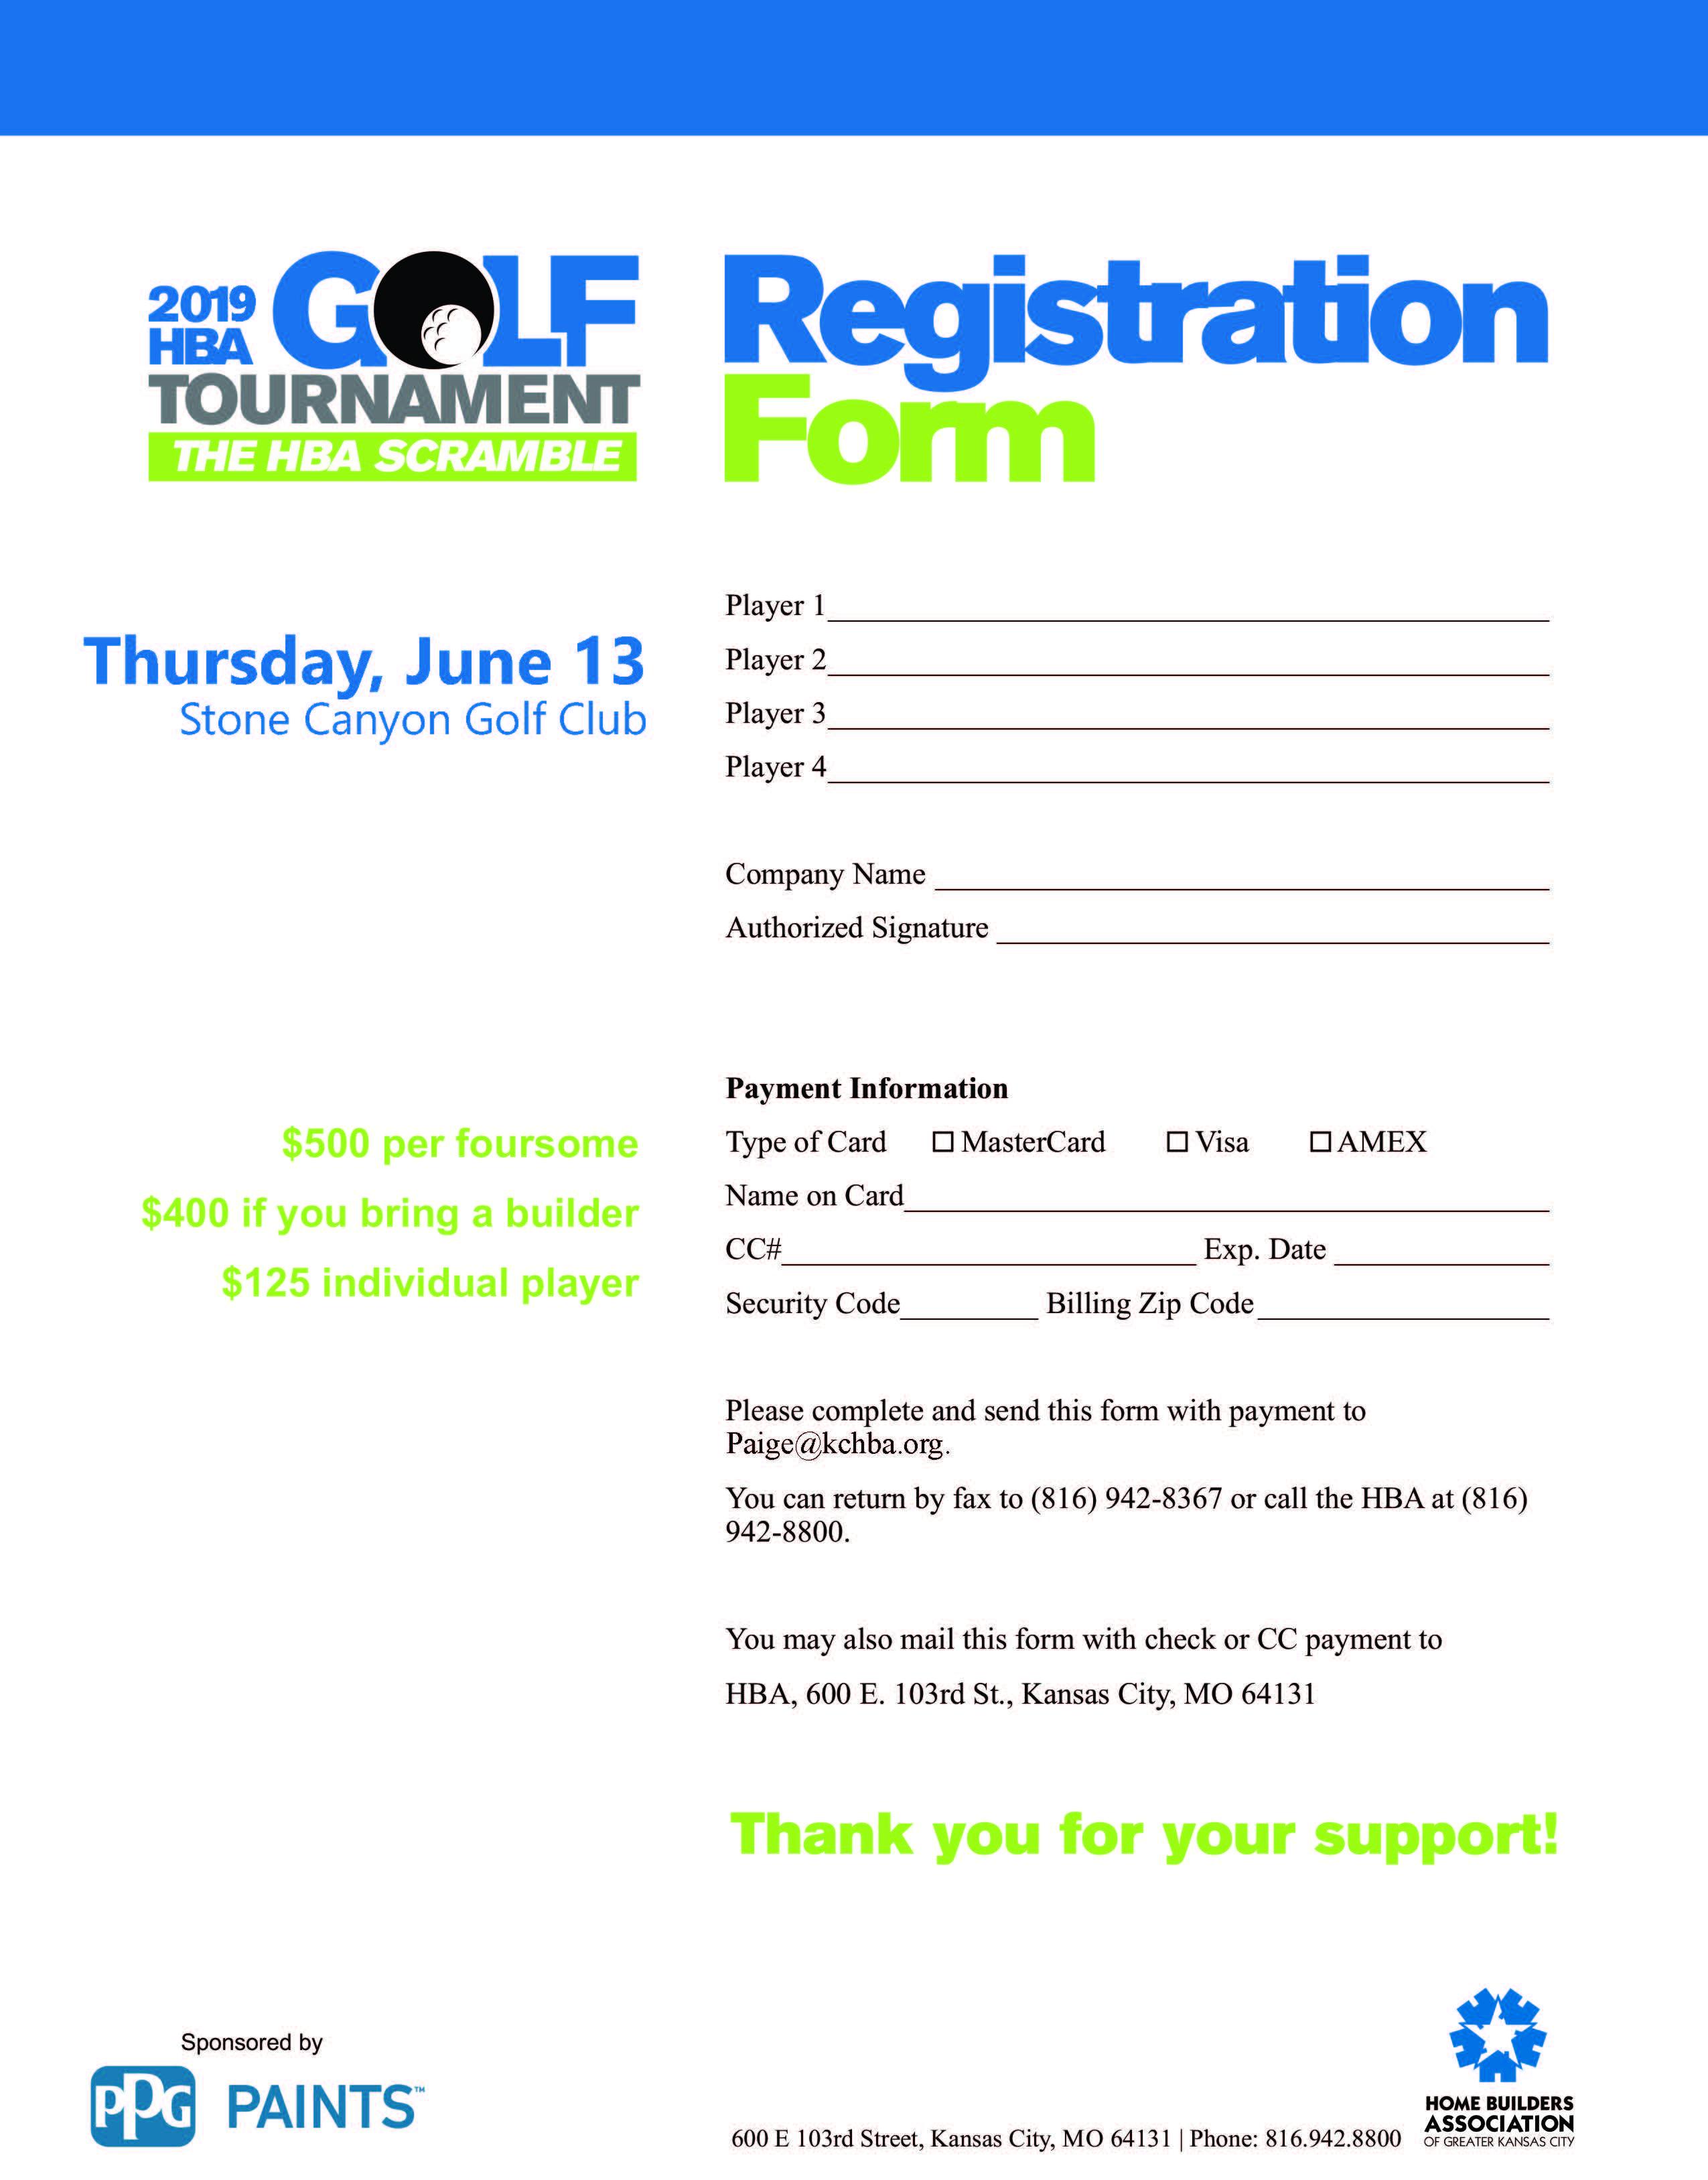 Free golf tournament registration form template. 2019 Golf Registration Form Final Home Builders Association Of Greater Kansas City